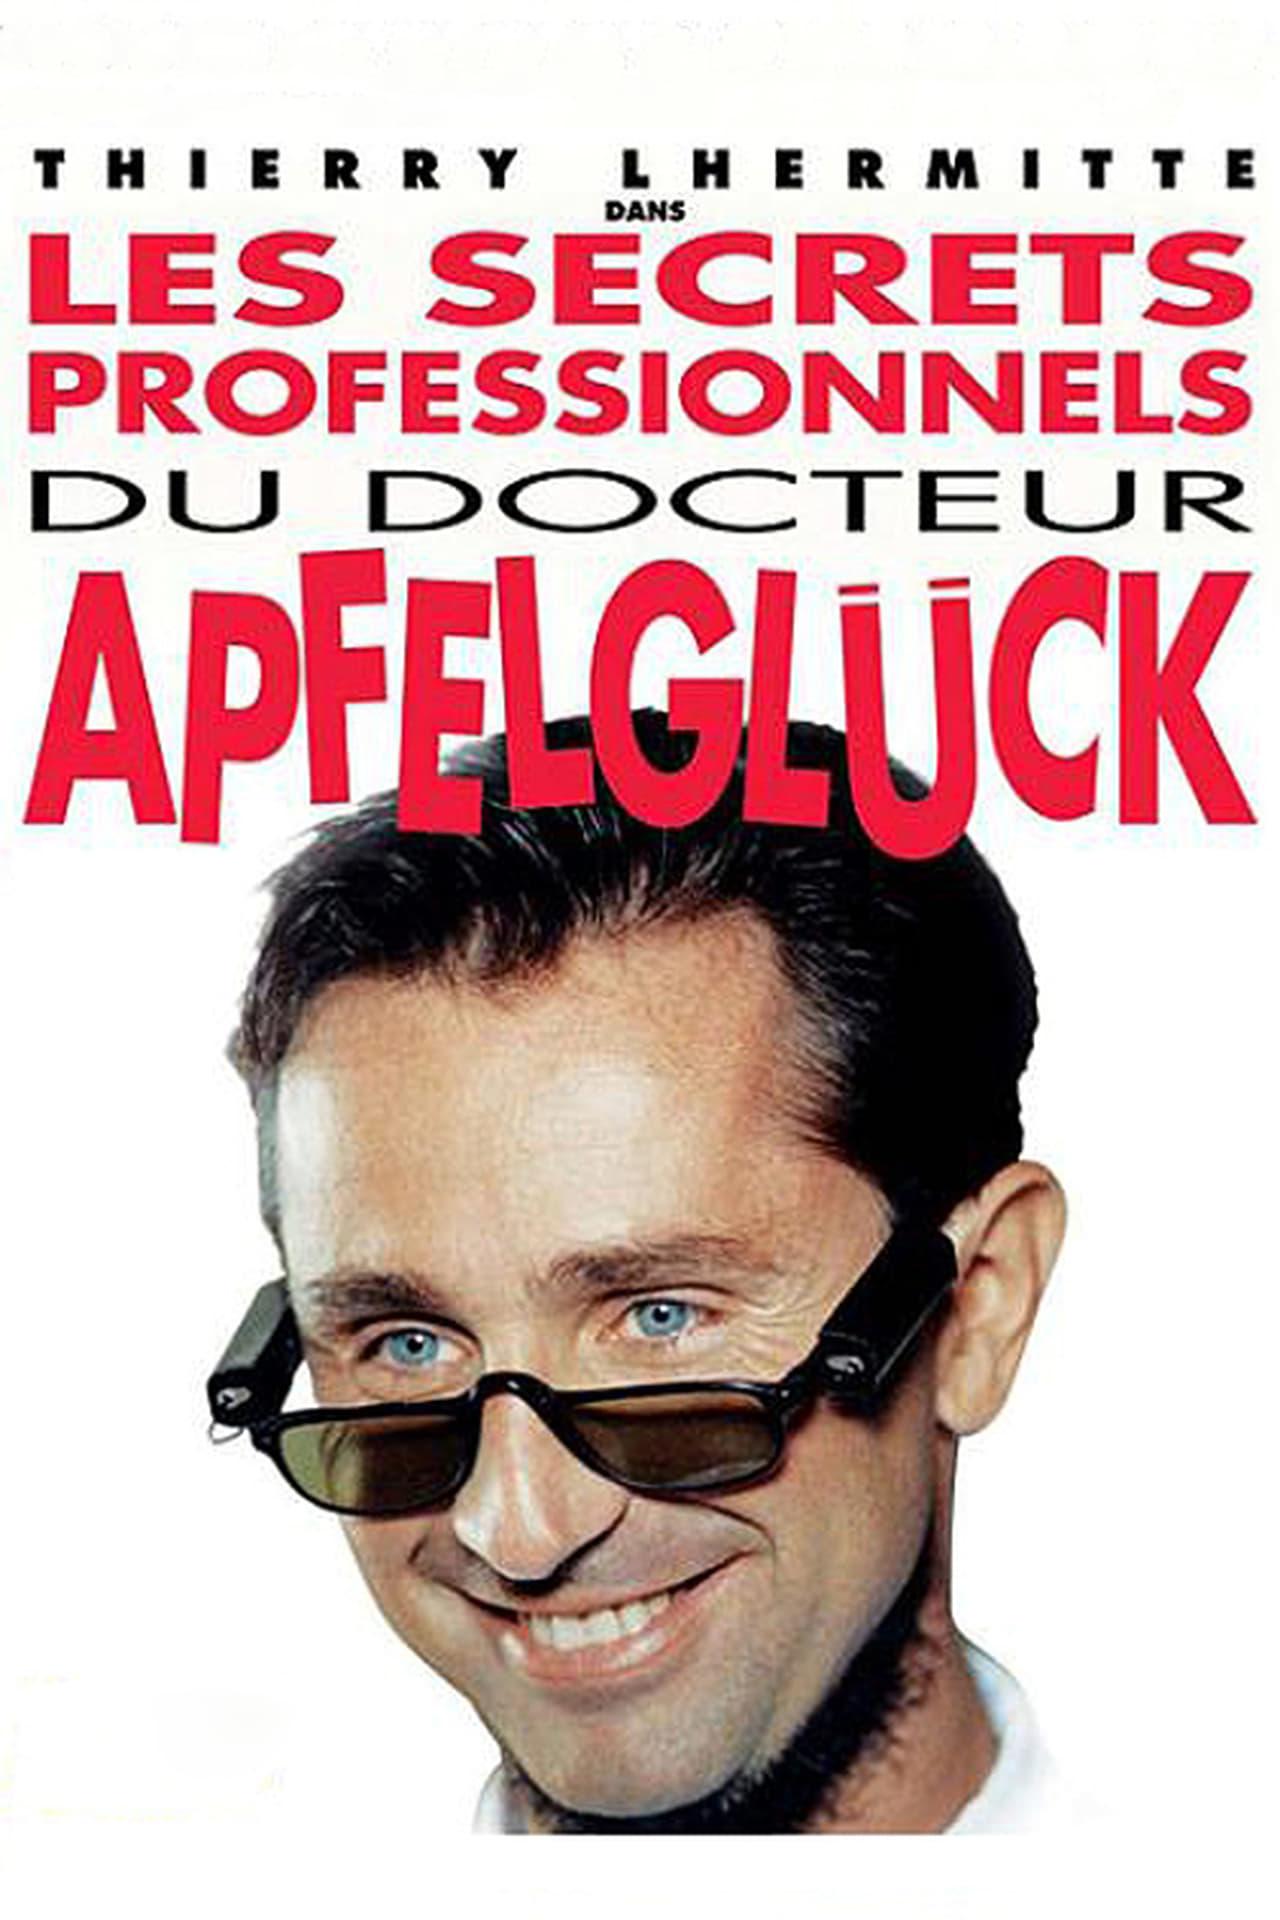 The Professional Secrets of Dr. Apfelgluck